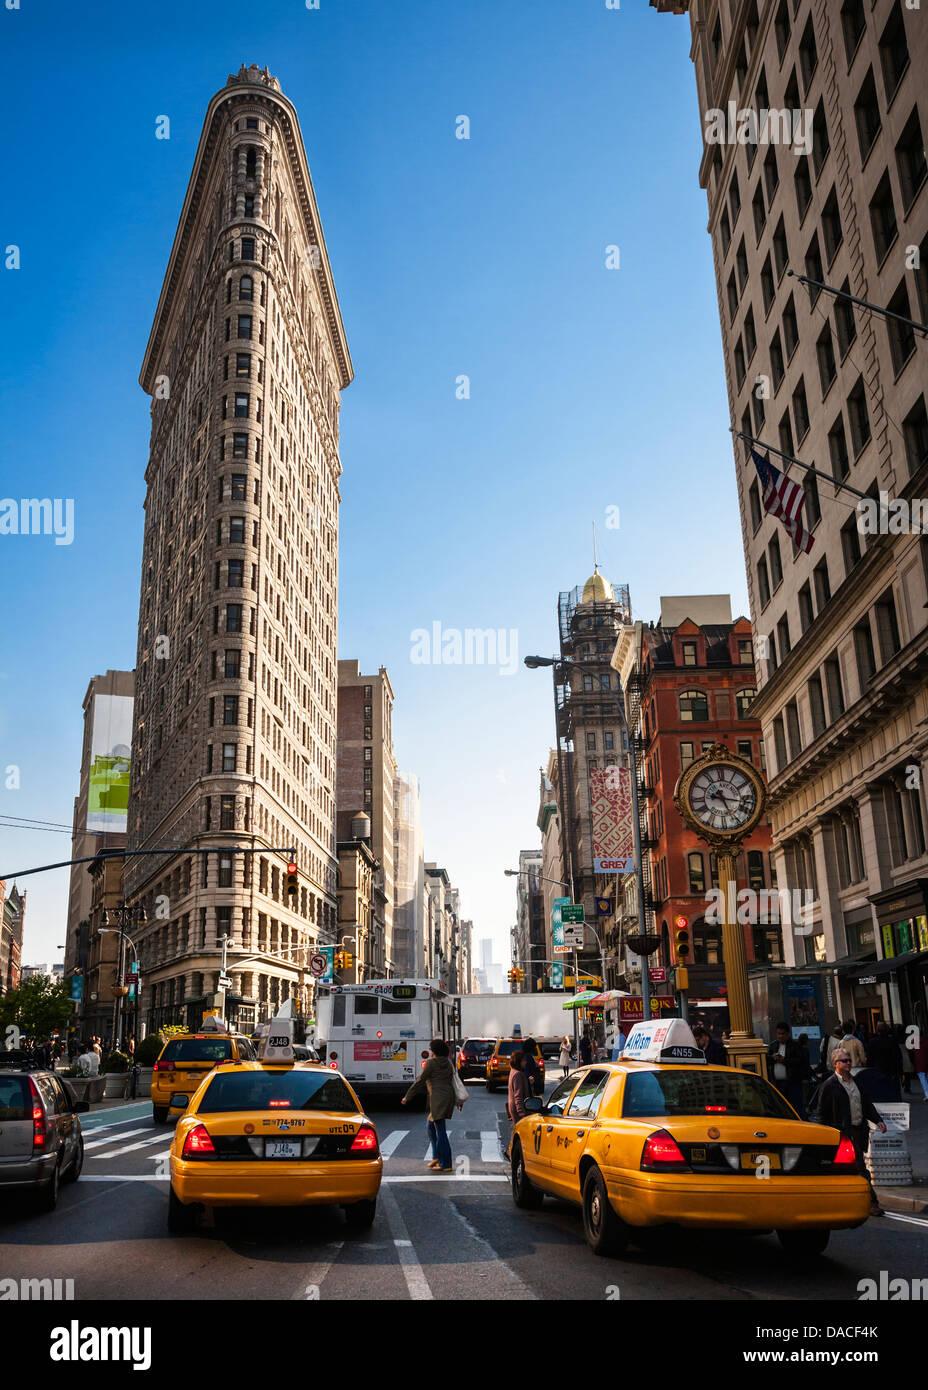 The Flatiron Building, 23rd Street, Manhattan, New York City, USA. - Stock Image